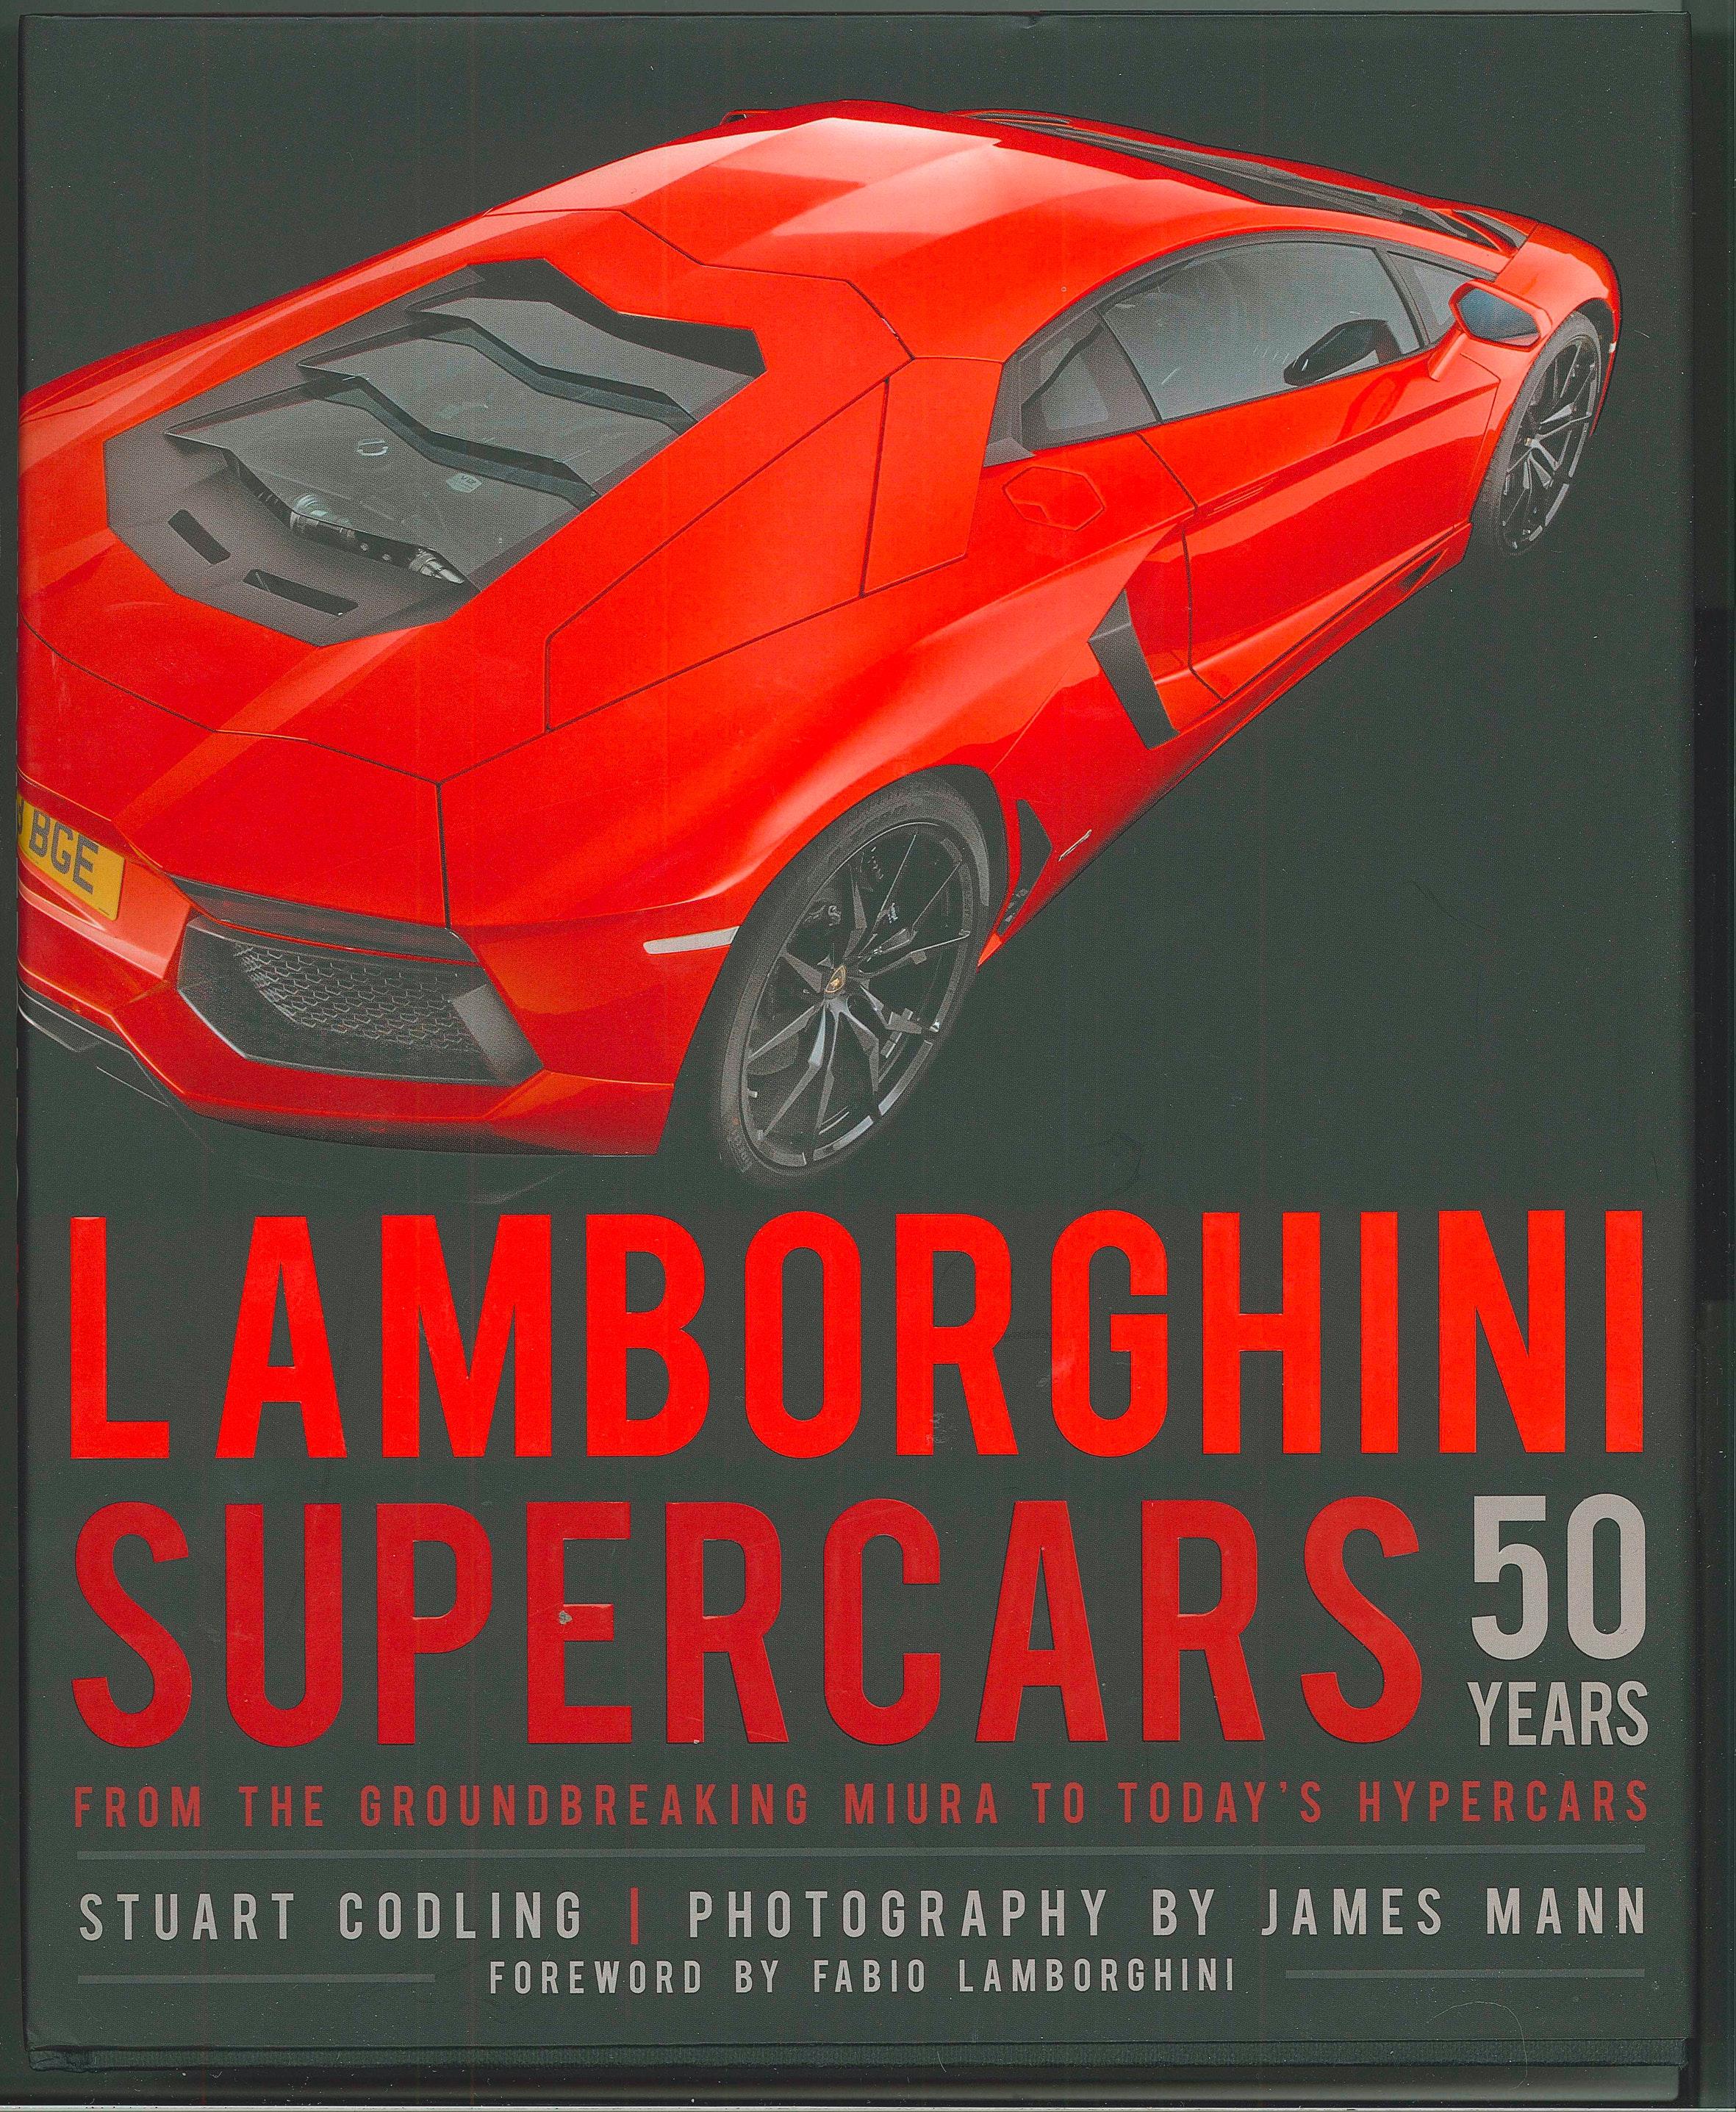 Lamborghinisupercars